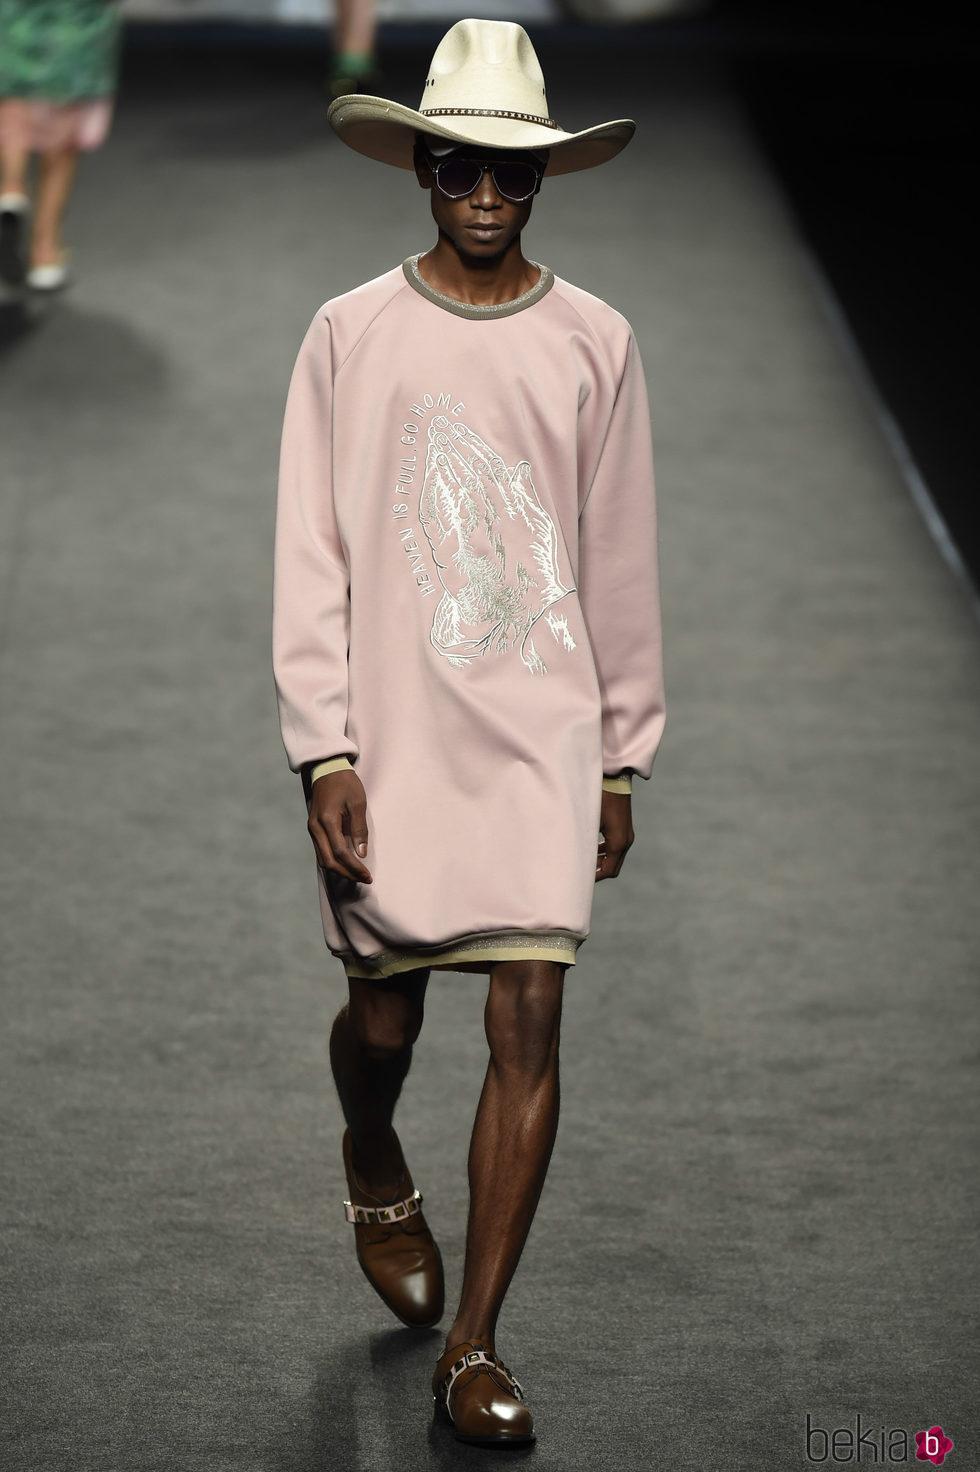 Sudadera larga rosa de hombre de Ana Locking primavera/verano 2018 para Madrid Fashion Week